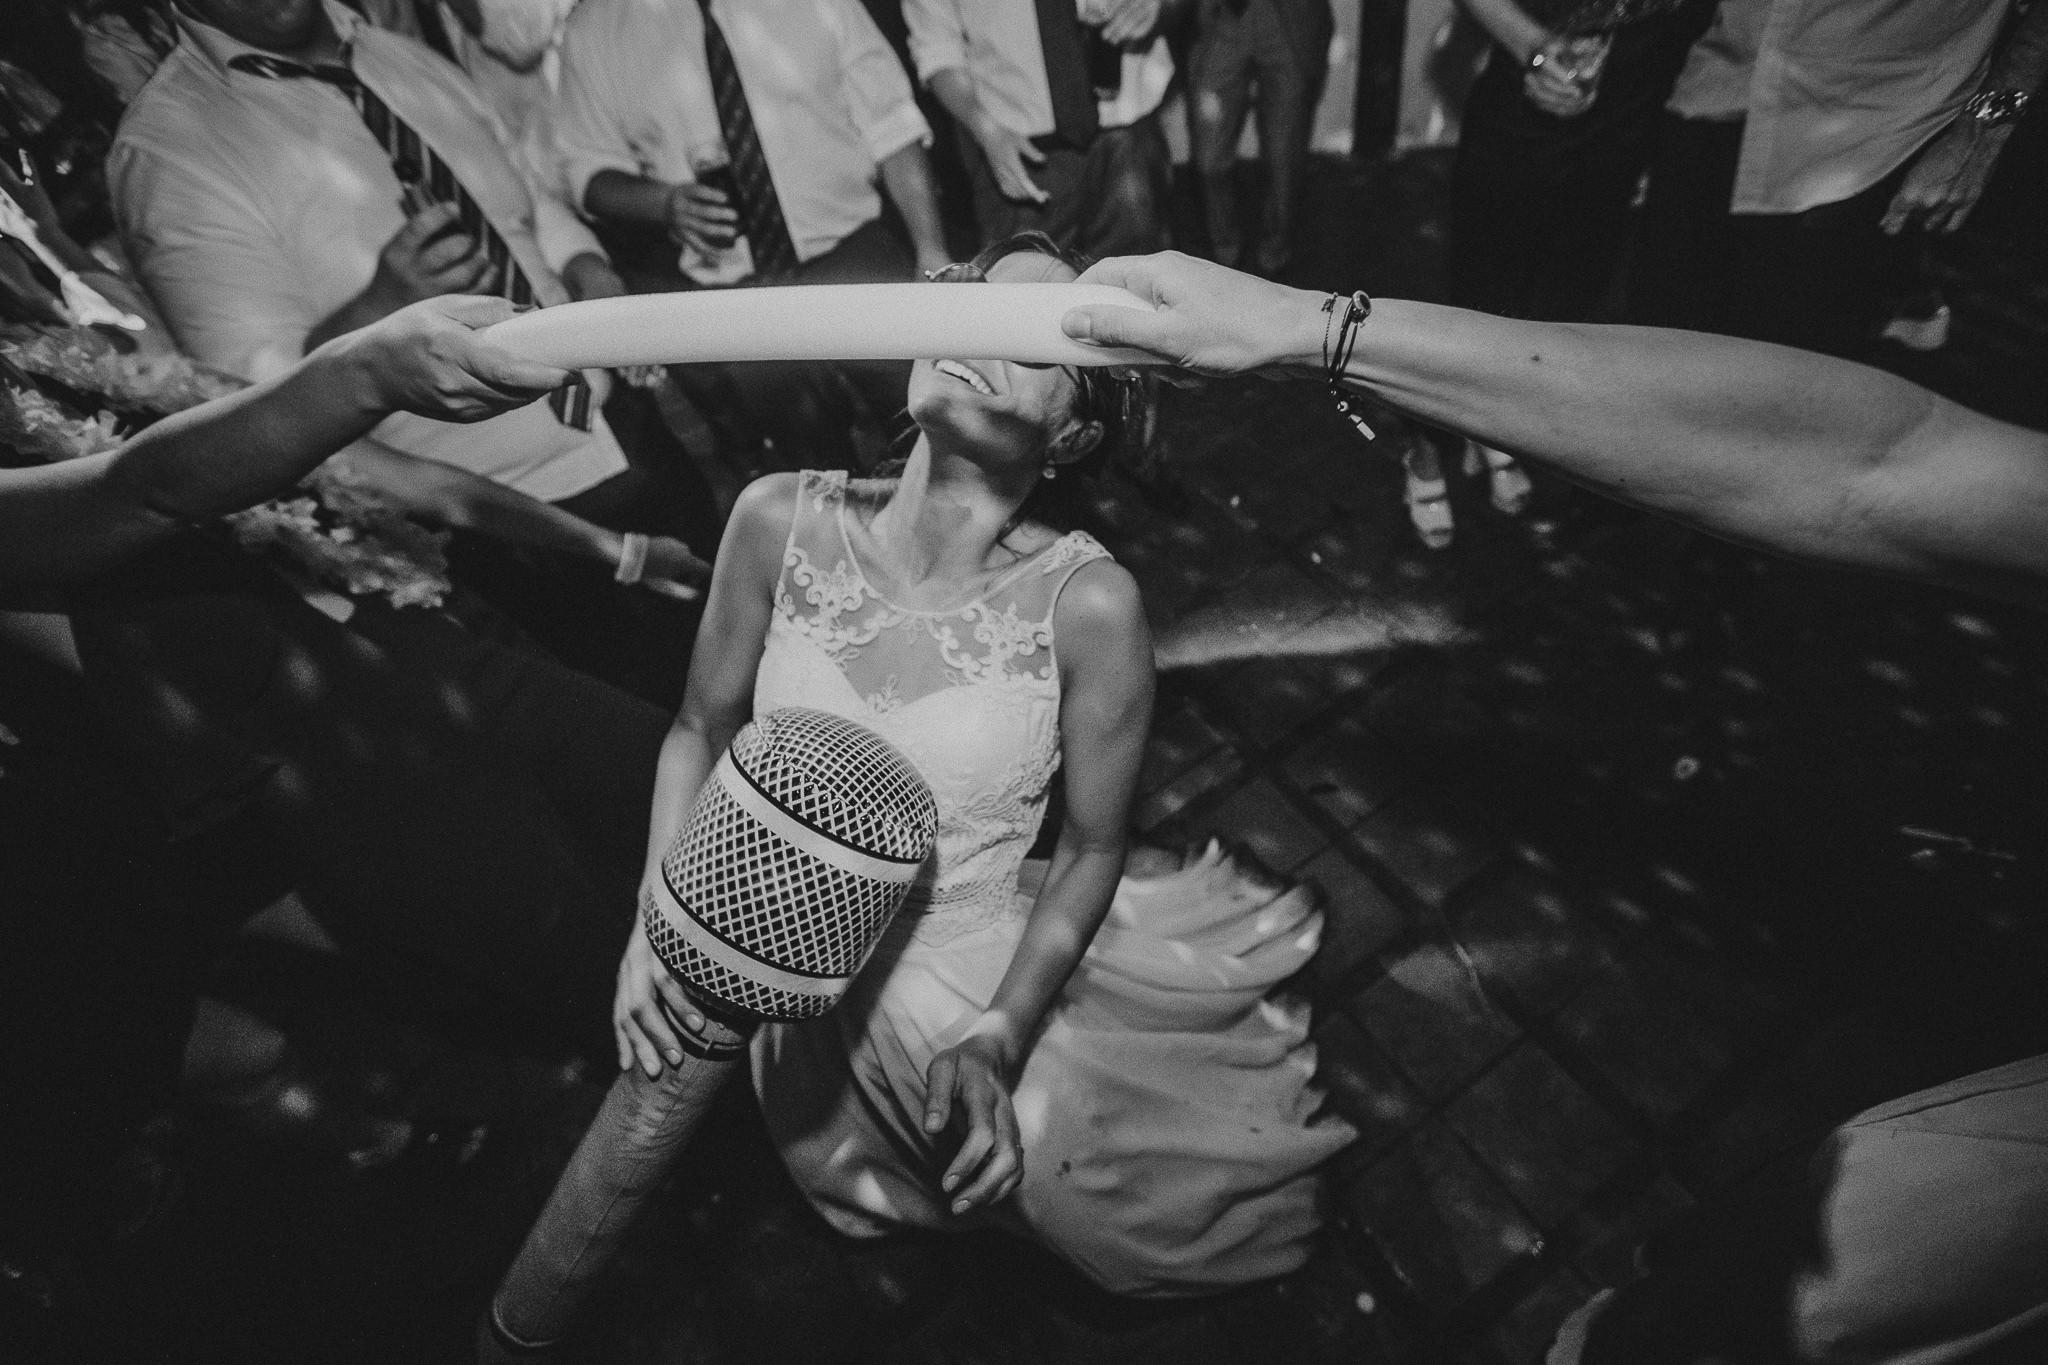 boda en lacrosse - fotografía espontánea de bodas - fotos de boda uruguay - I&P65